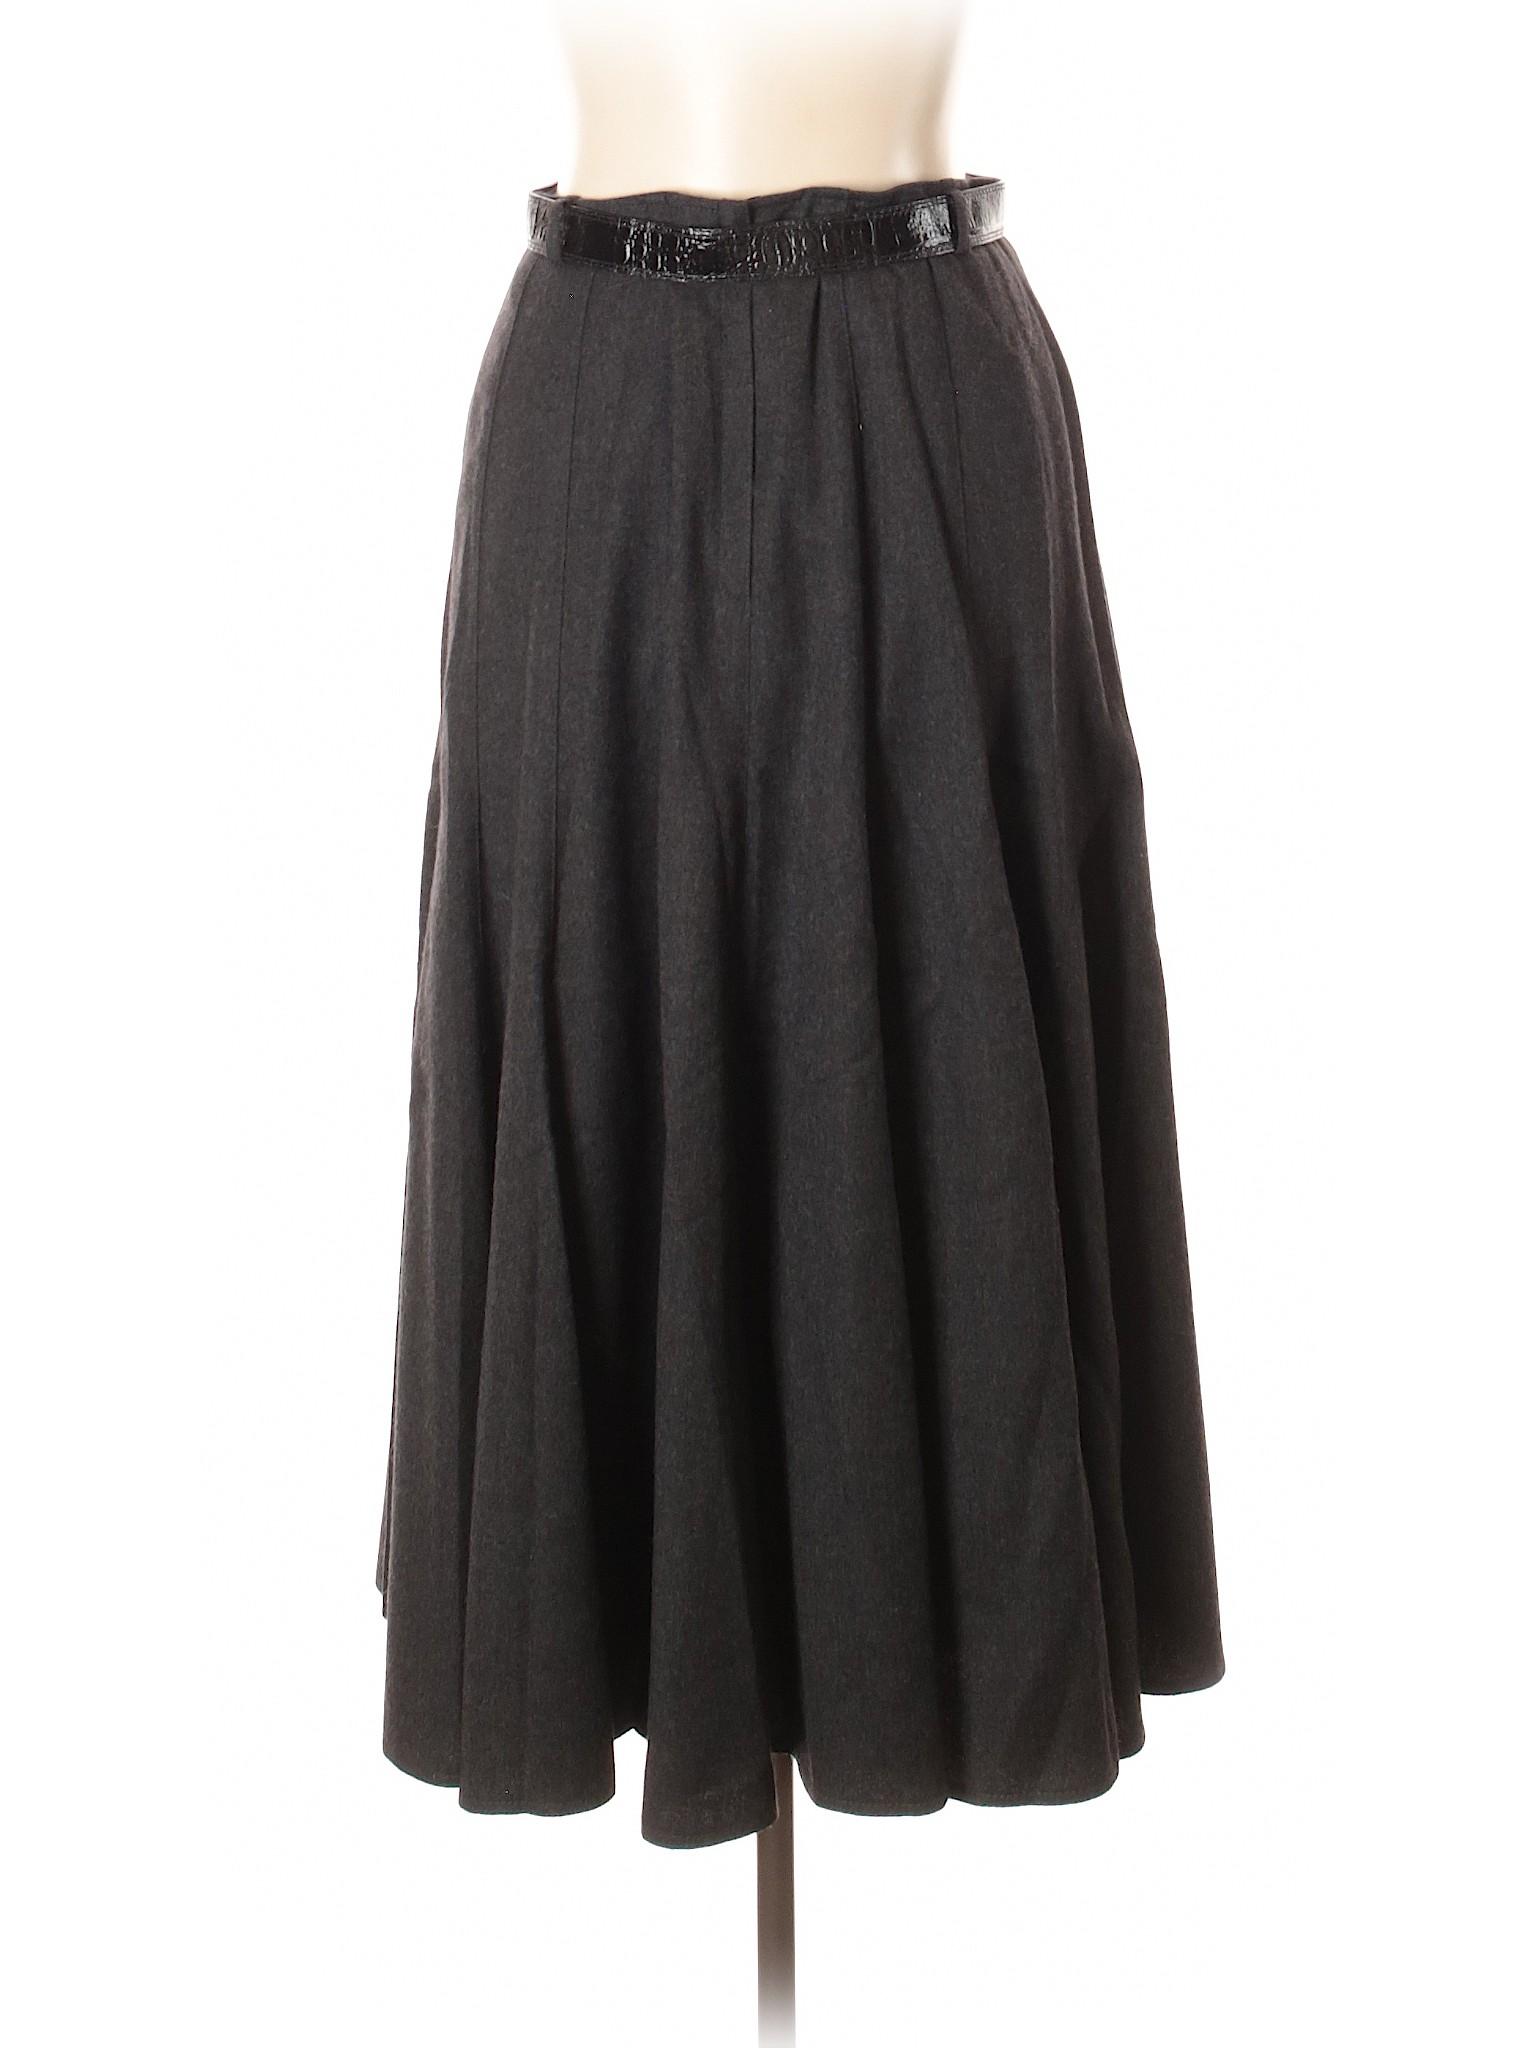 Wool Skirt Boutique Skirt Boutique Skirt Wool Skirt Wool Skirt Boutique Wool Wool Boutique Wool Boutique Skirt Boutique RwCPqxBSR